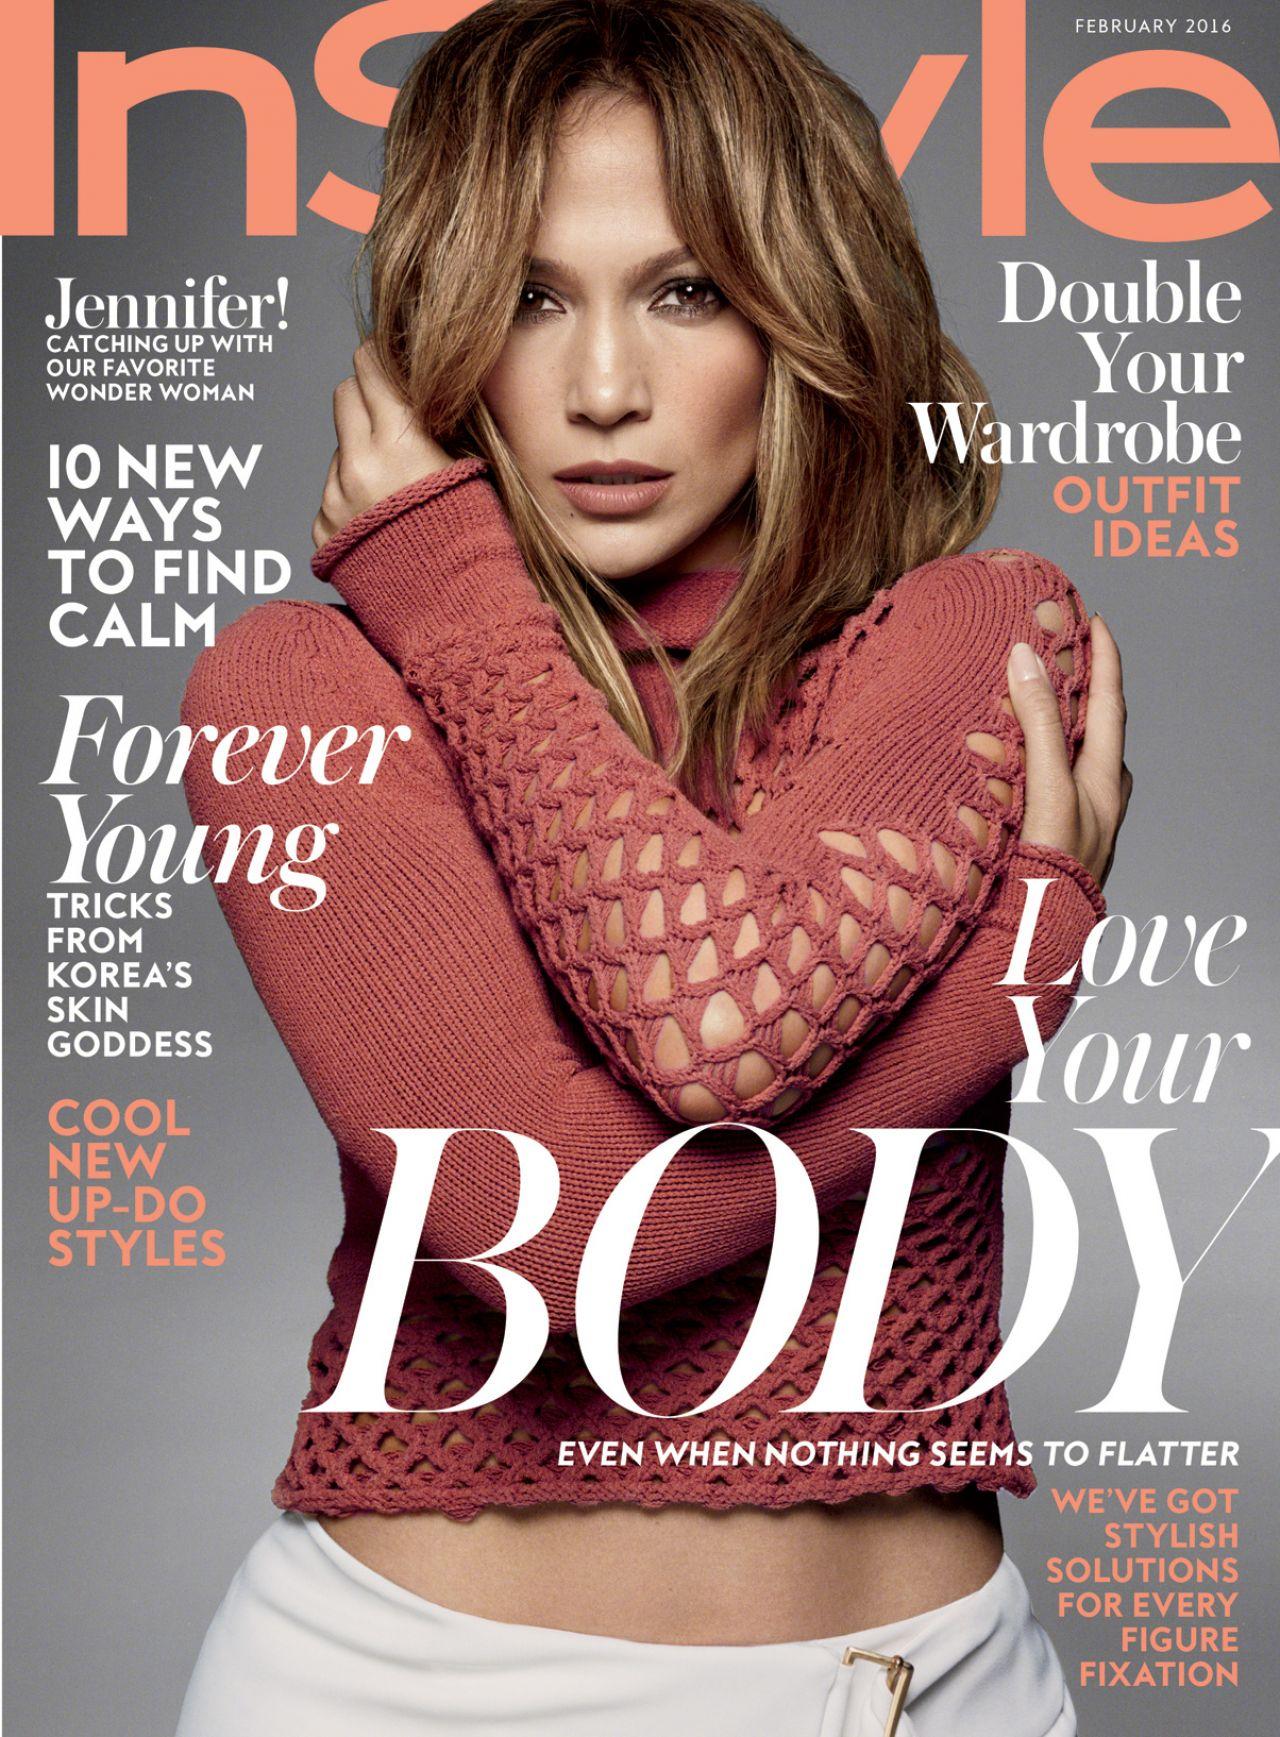 InStyle Magazine February 2016 Cover